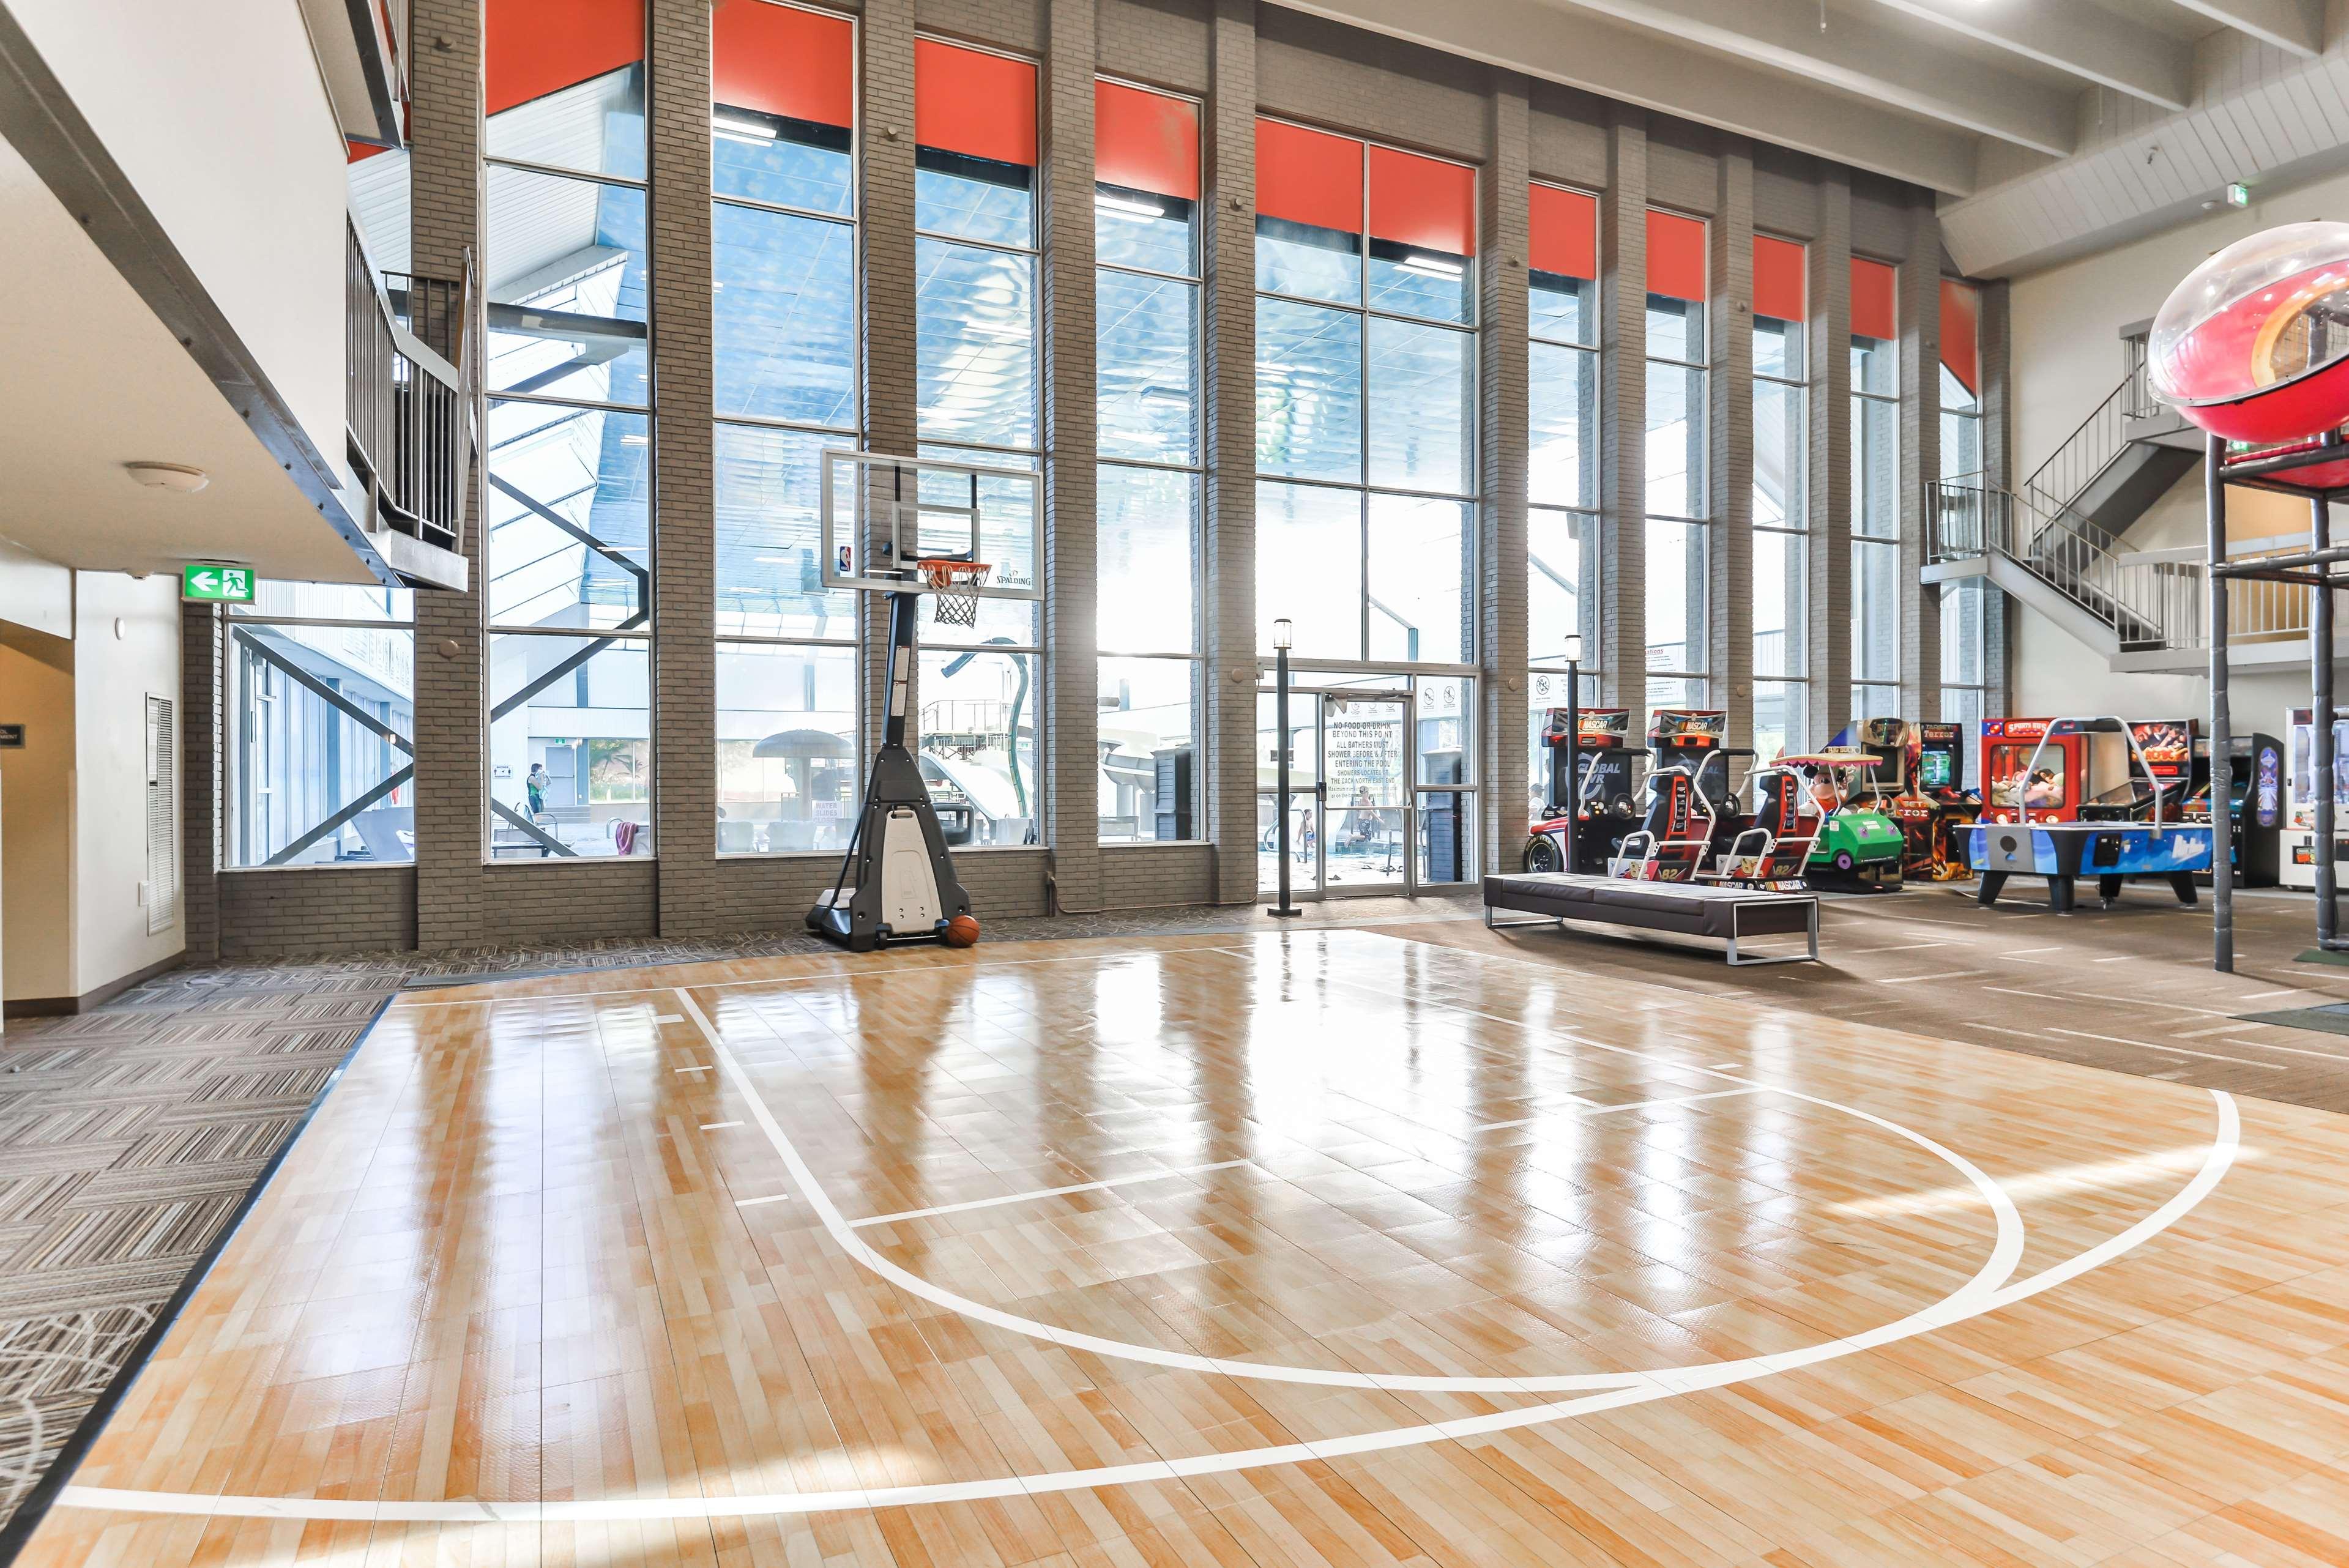 Basketball Court Best Western Plus Leamington Hotel & Conference Centre Leamington (519)326-8646